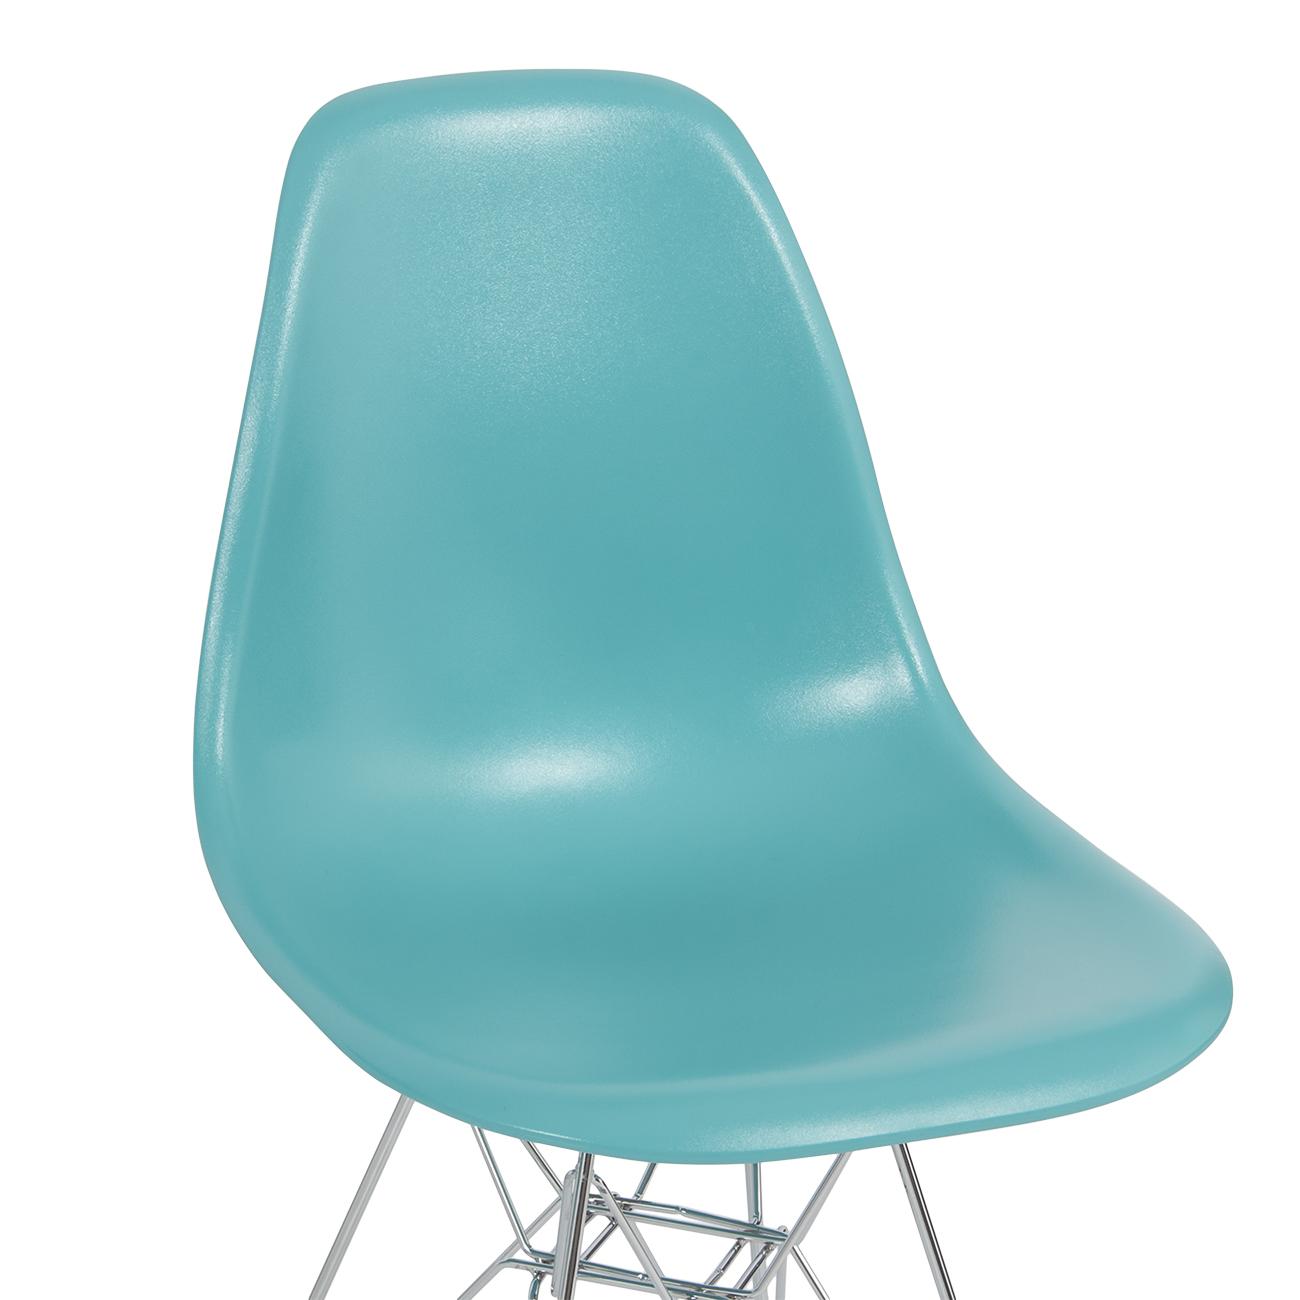 2x Style DSW Modern Eiffel Side Chair Molded